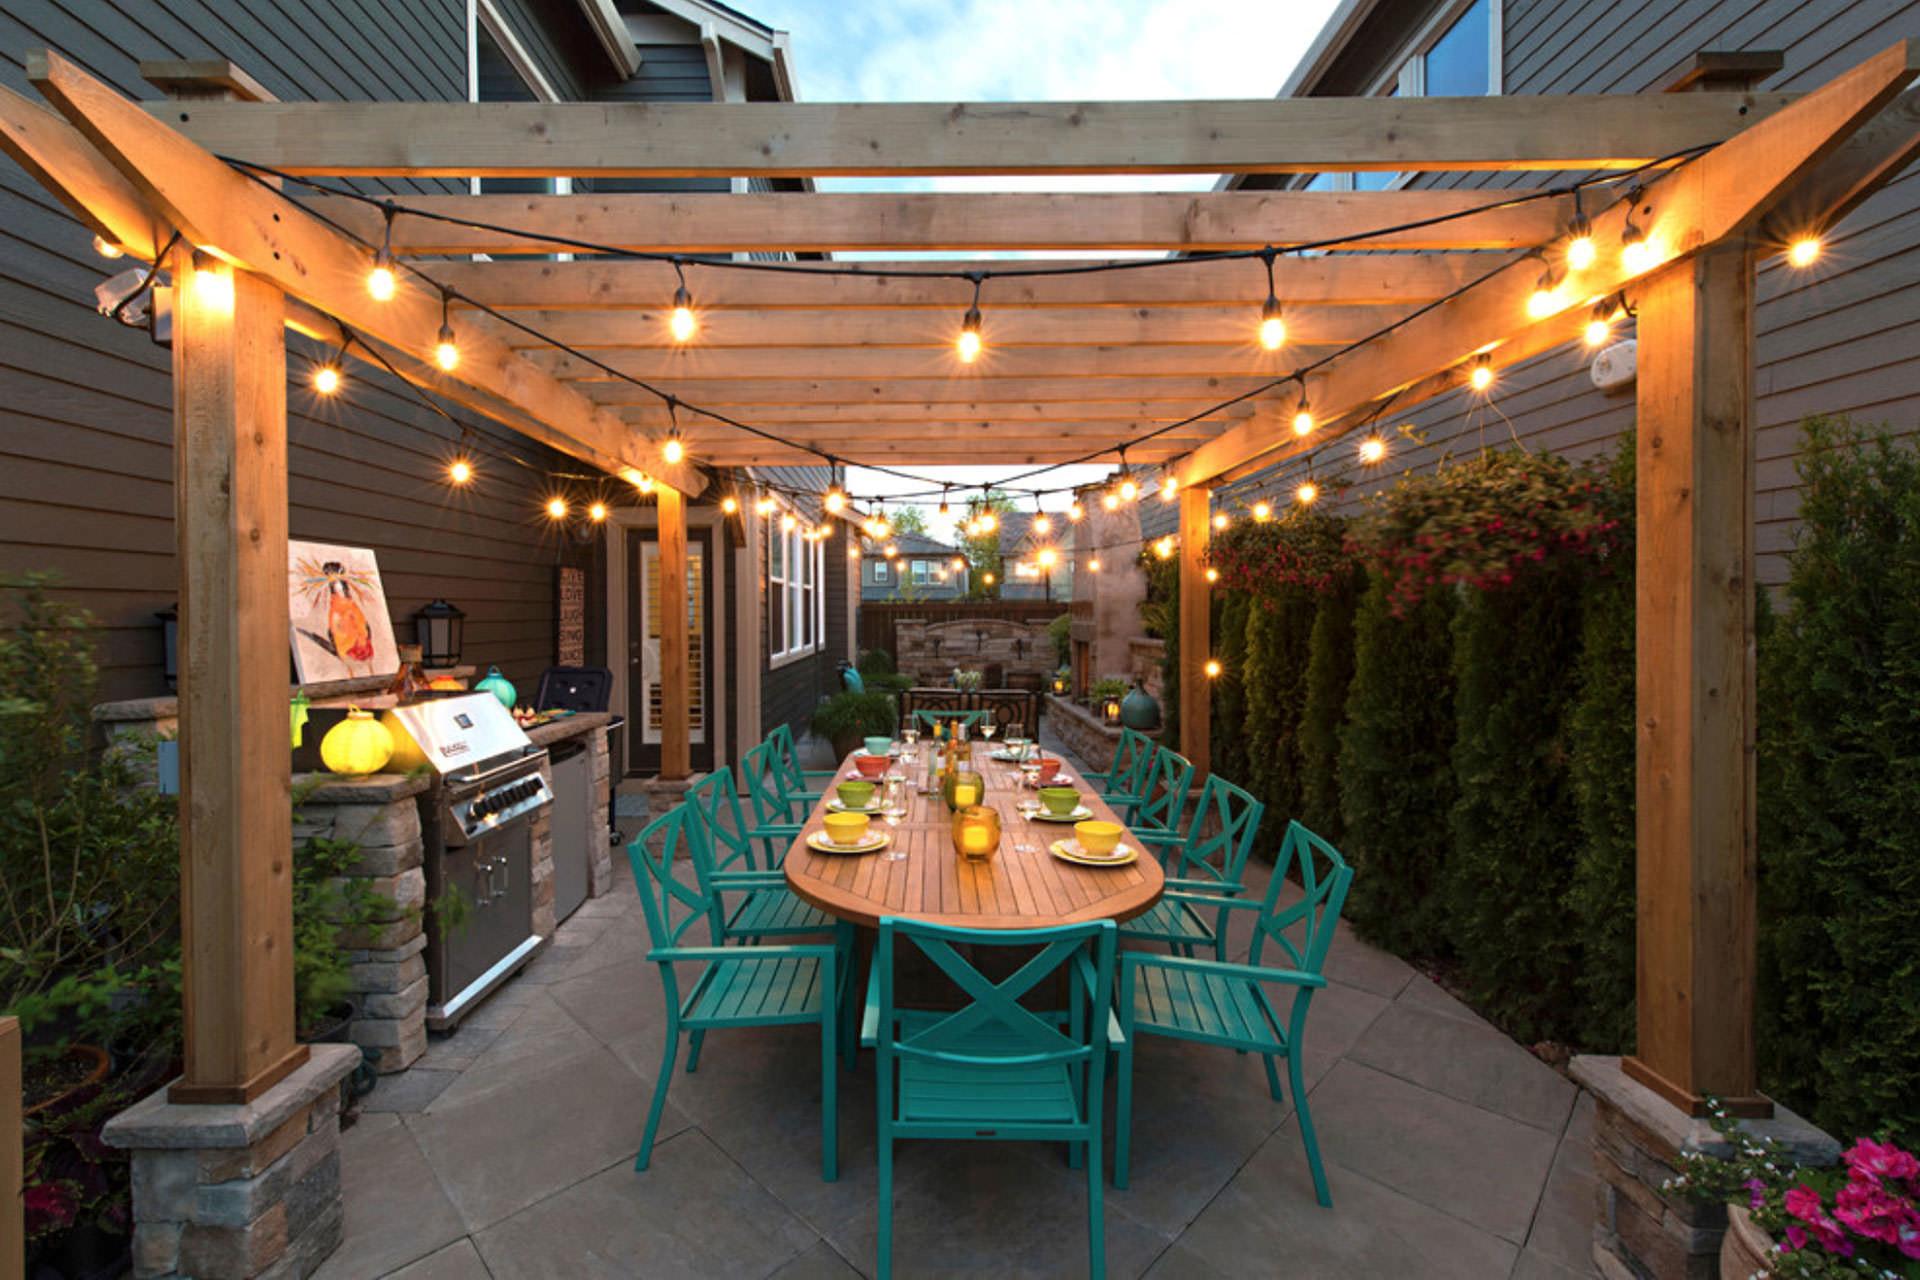 Five Pergola Lighting Ideas to Illuminate Your Outdoor Space on Backyard String Light Designs id=90732